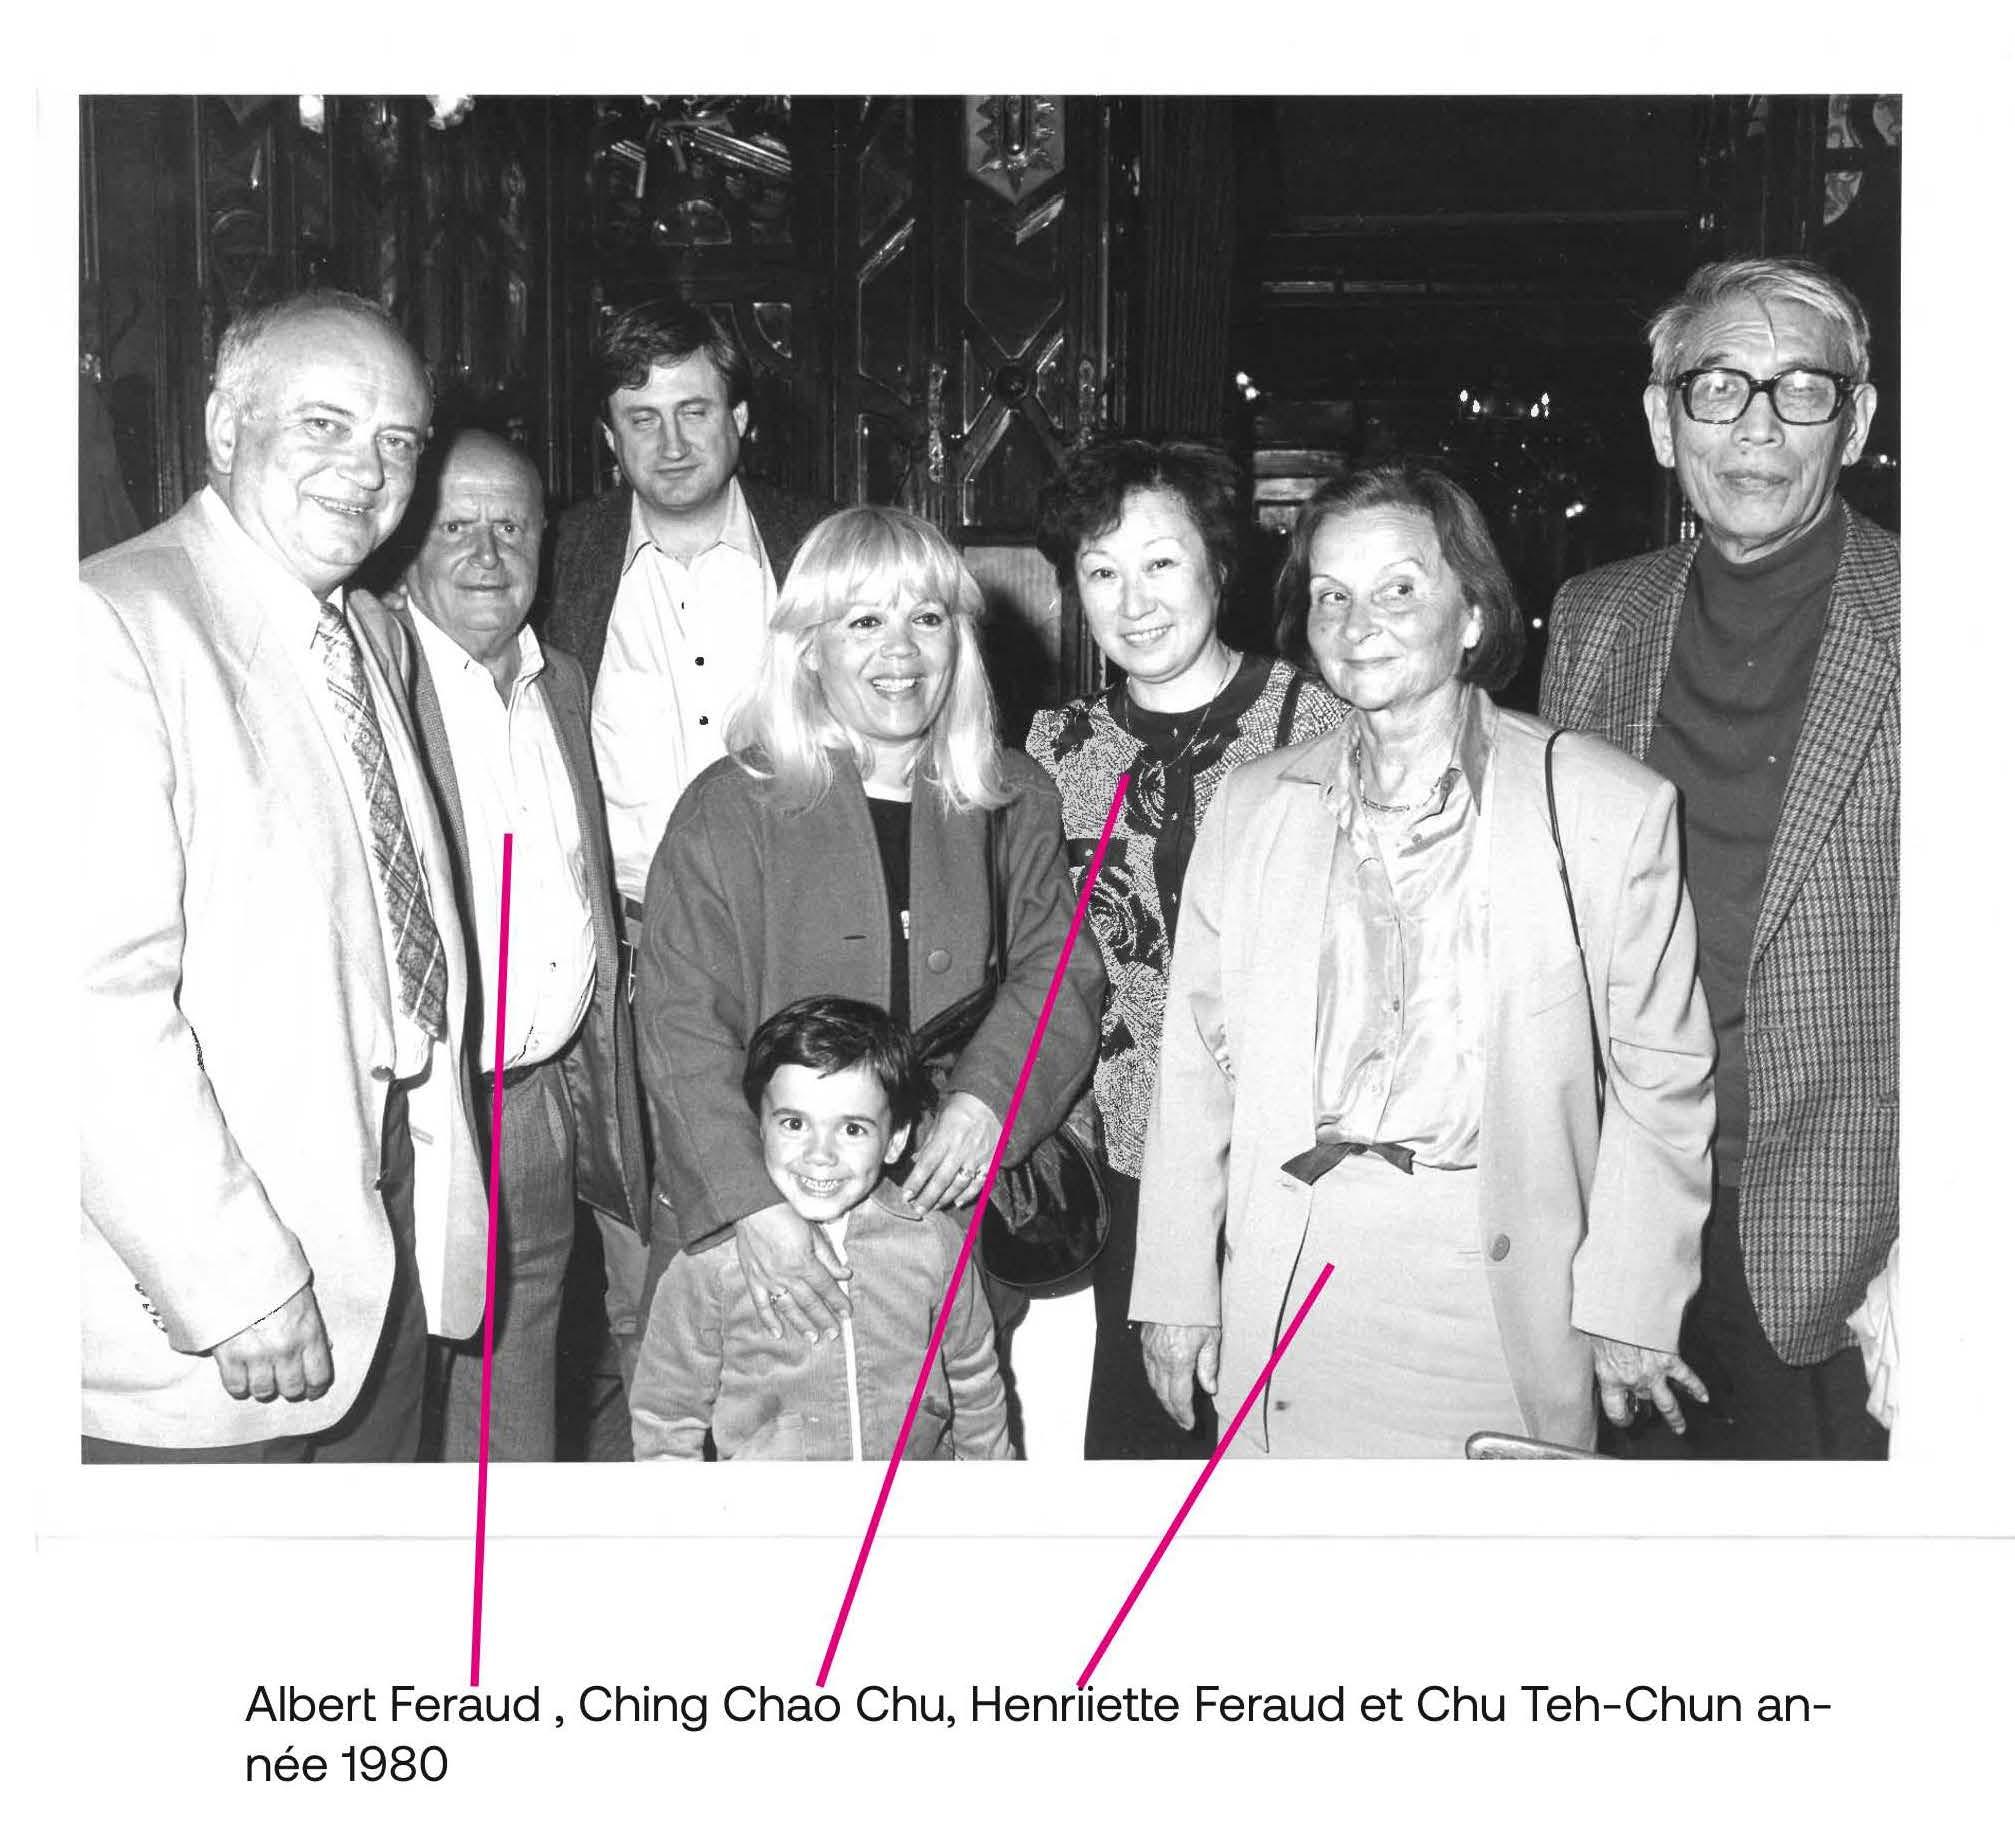 The families of Albert Féraud and Chu Teh-Chun in Paris in 1980